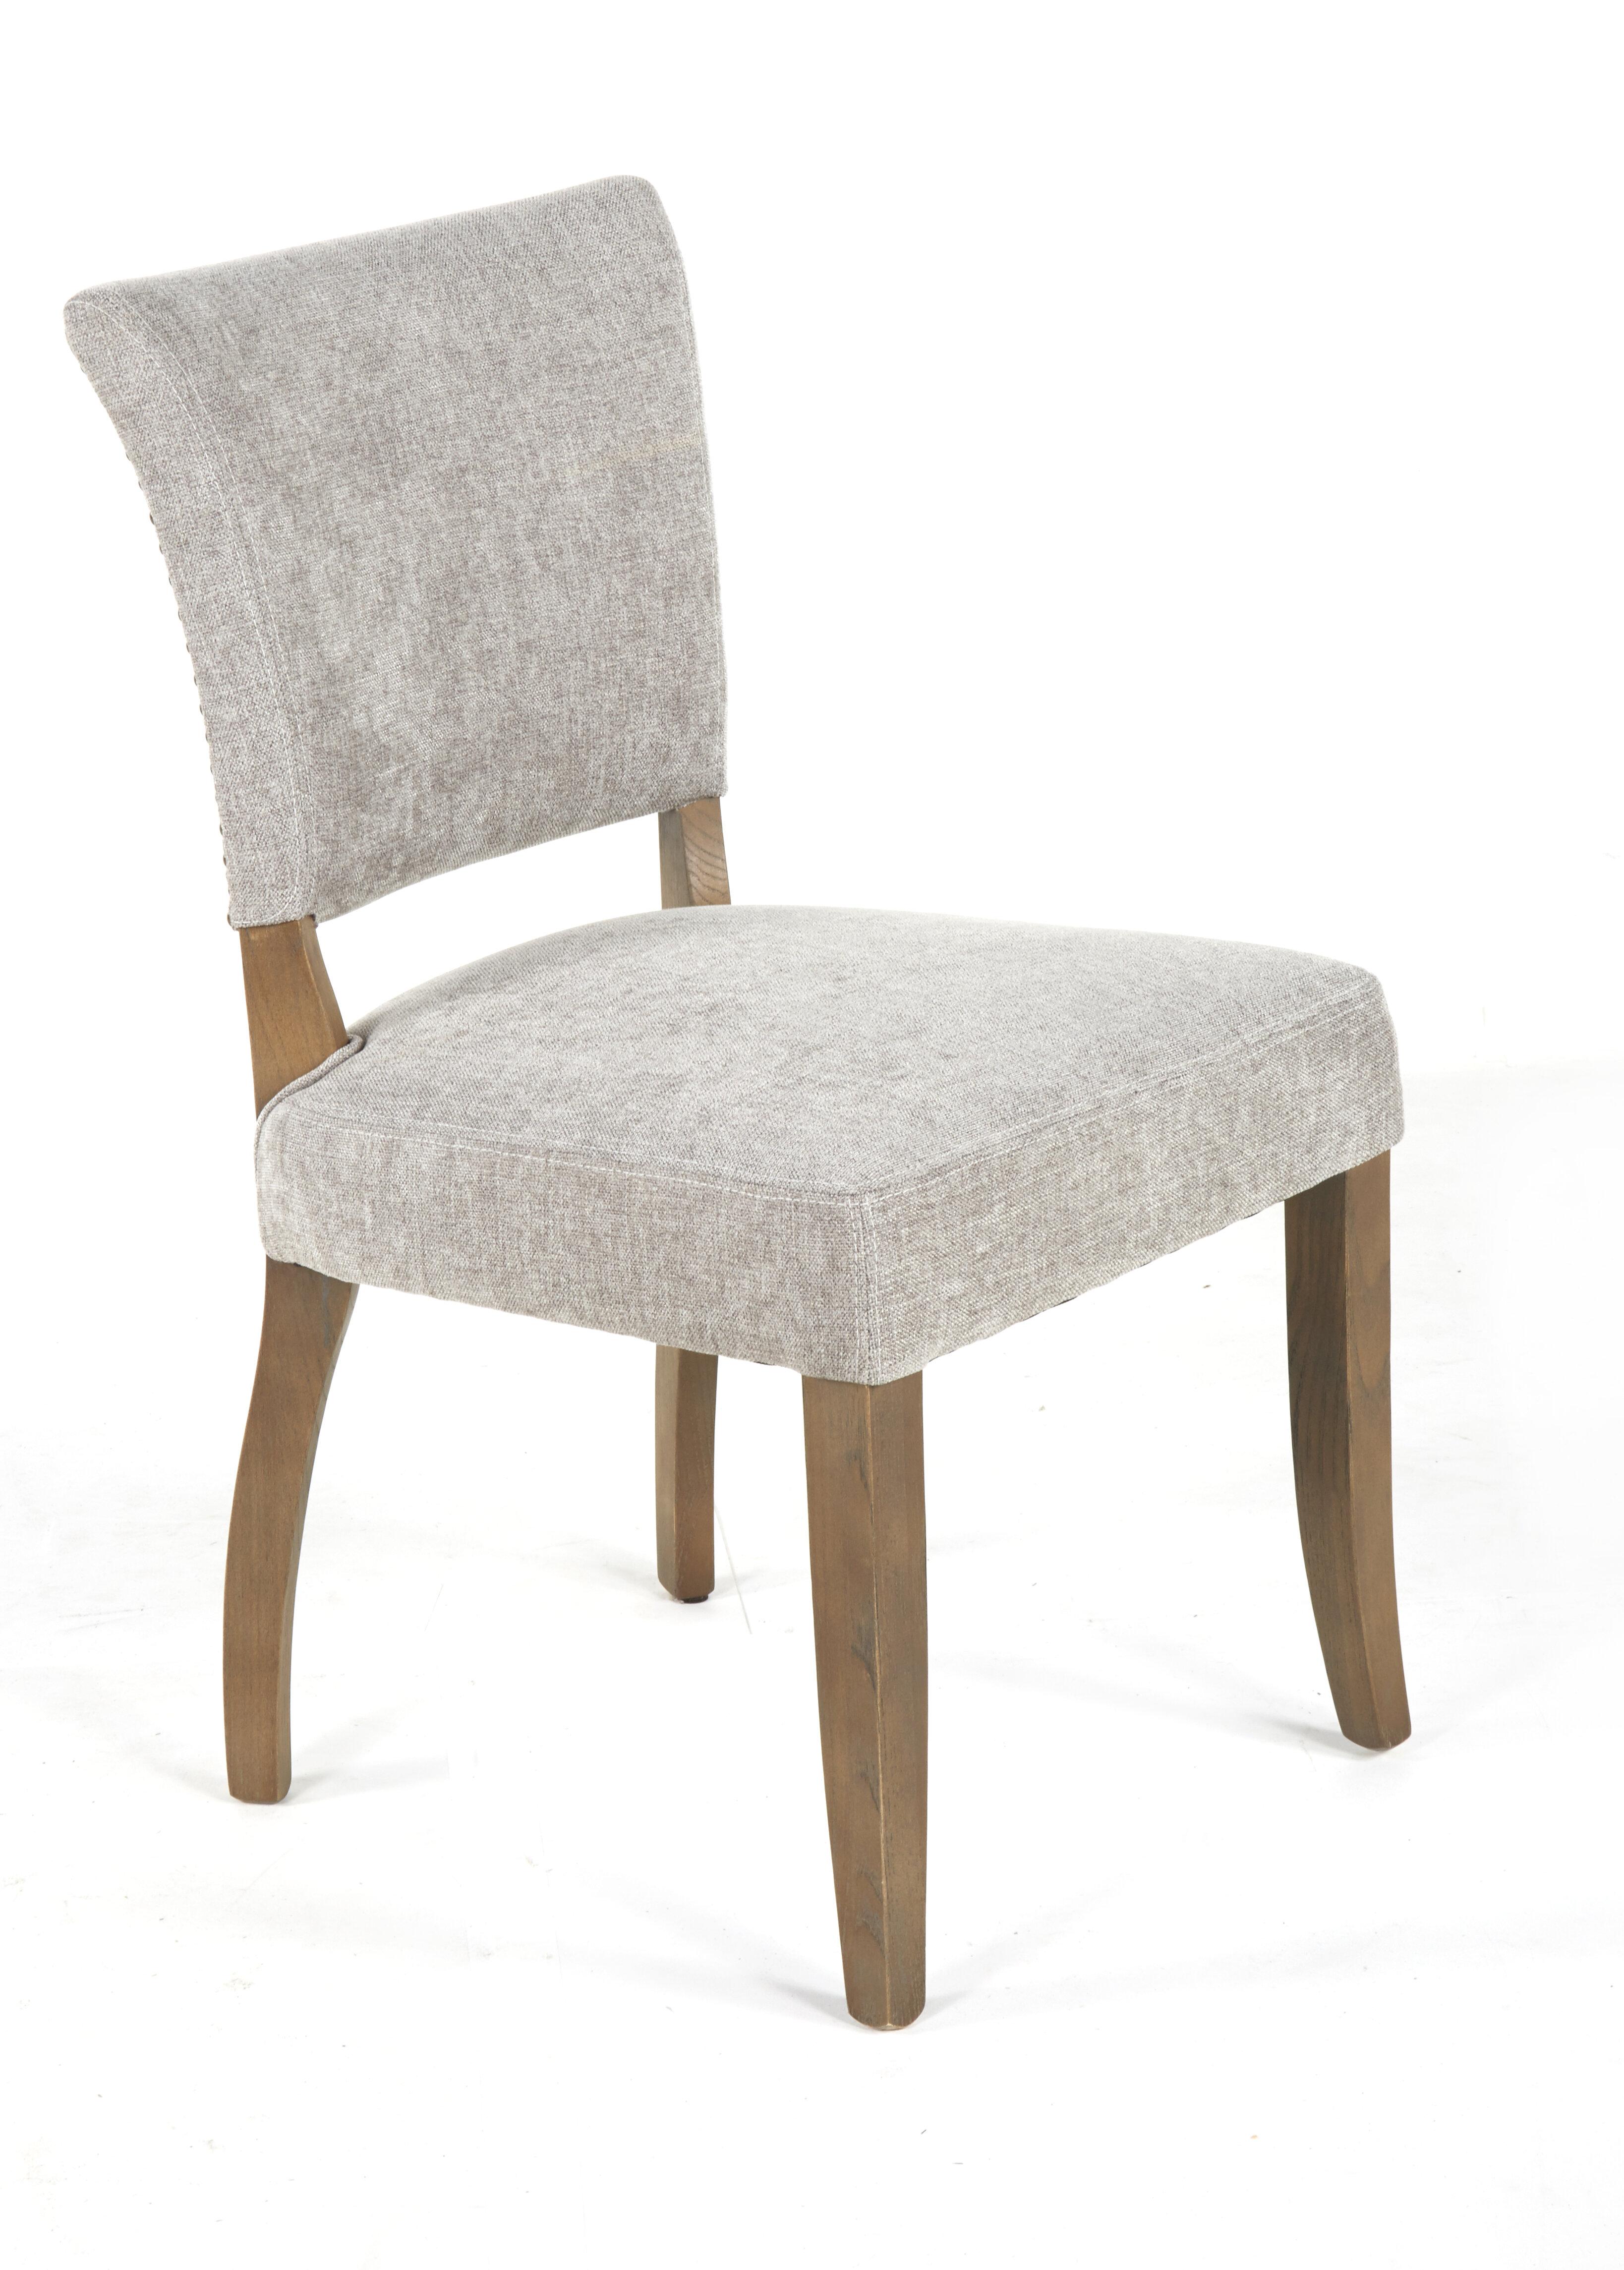 One Allium Way Burks Upholstered Dining Chair Wayfair